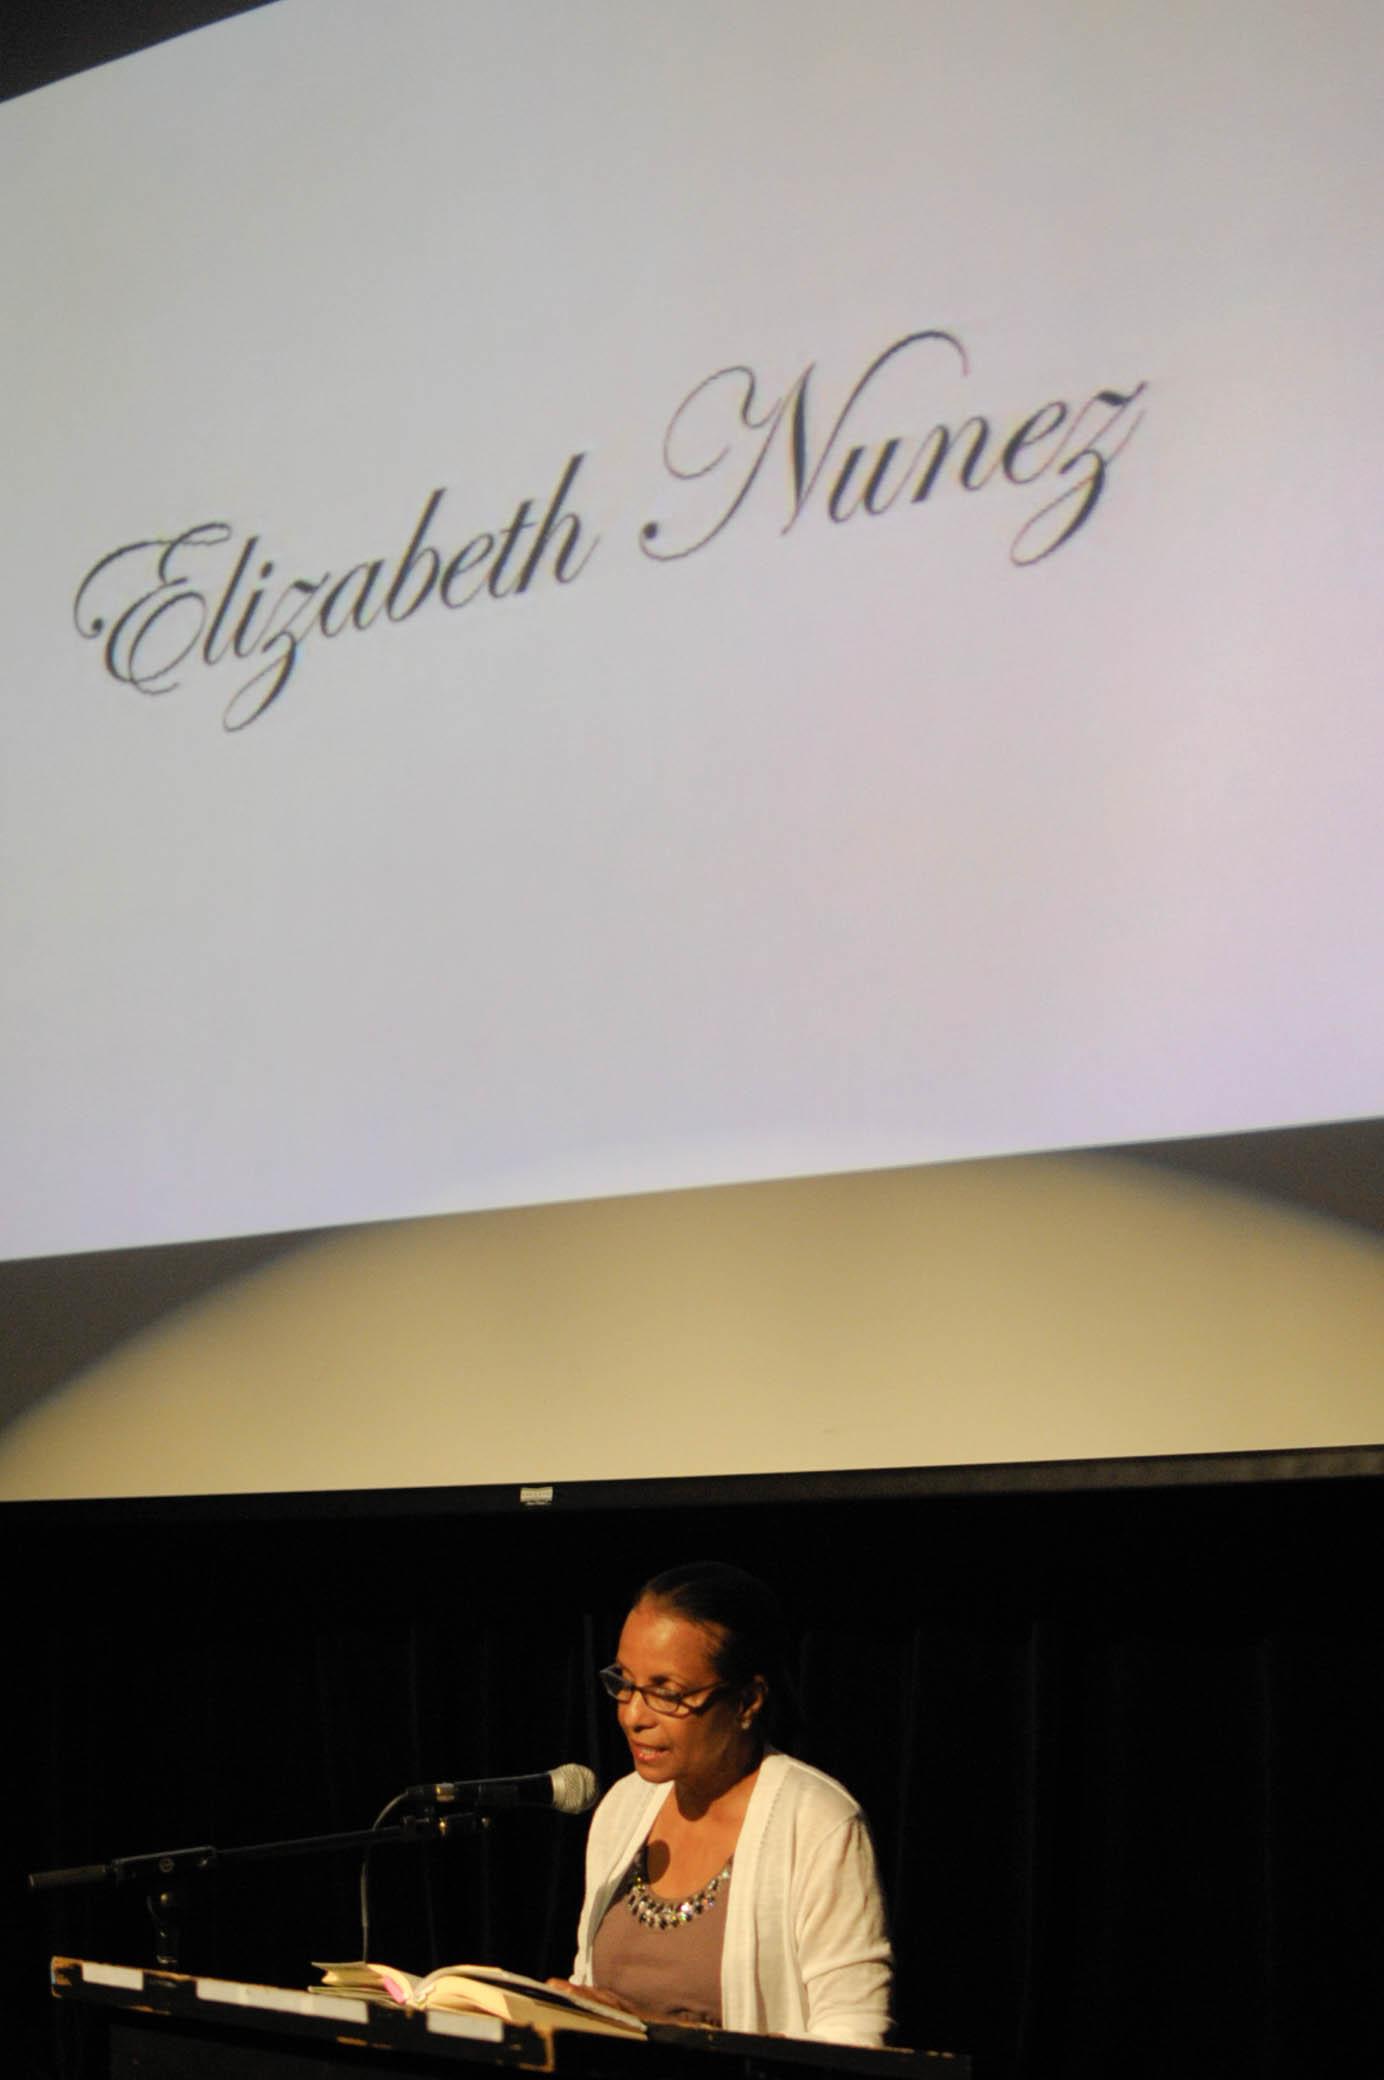 Elizabeth Nunez Reads